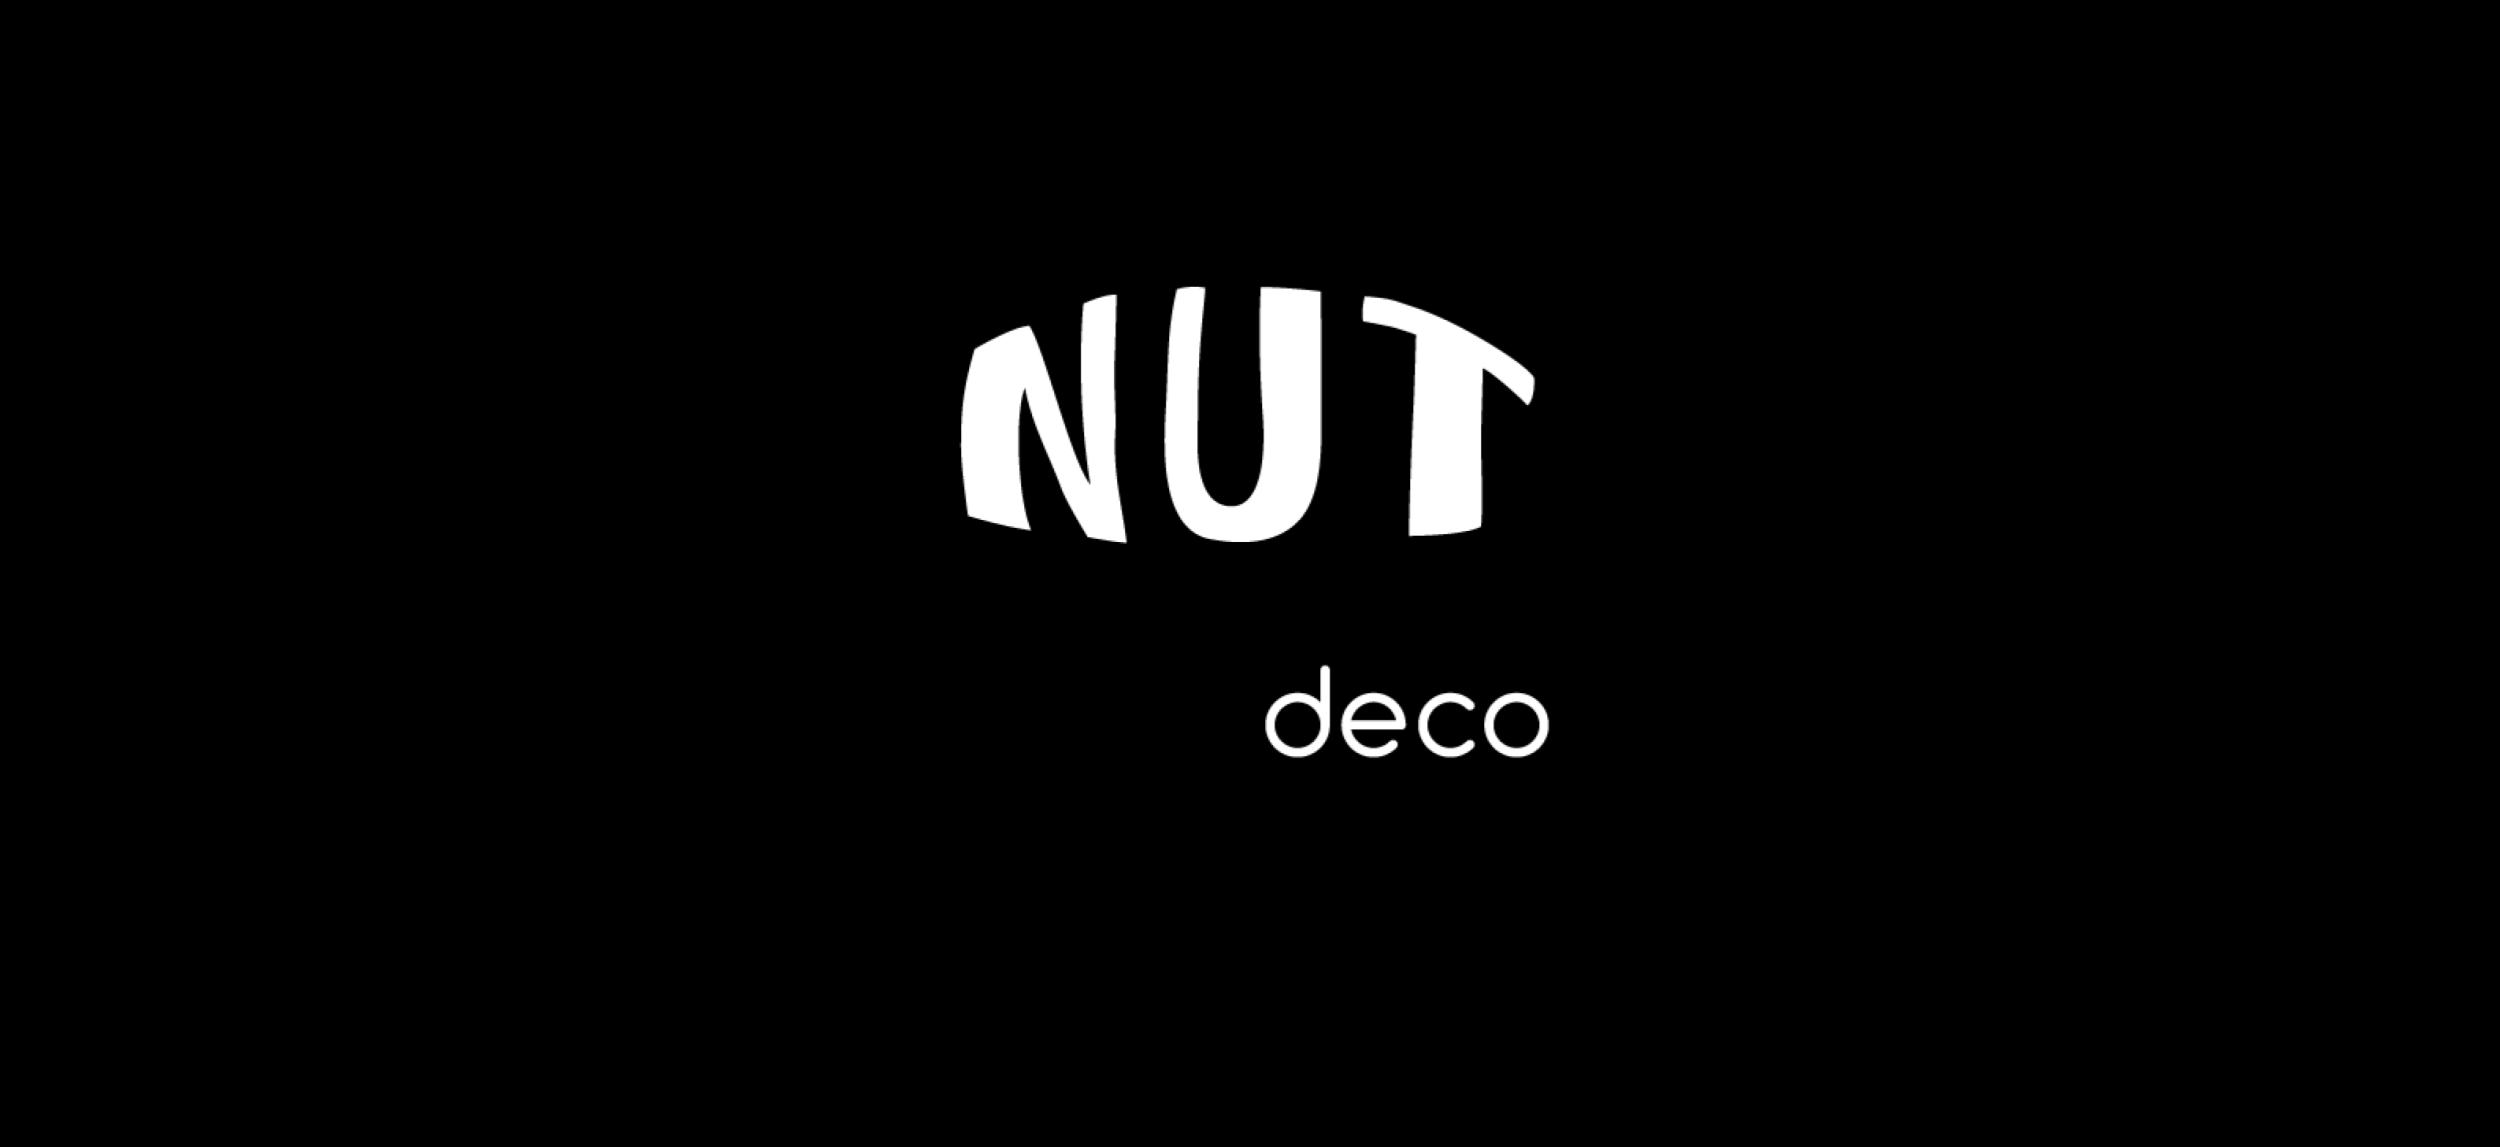 Nut deco